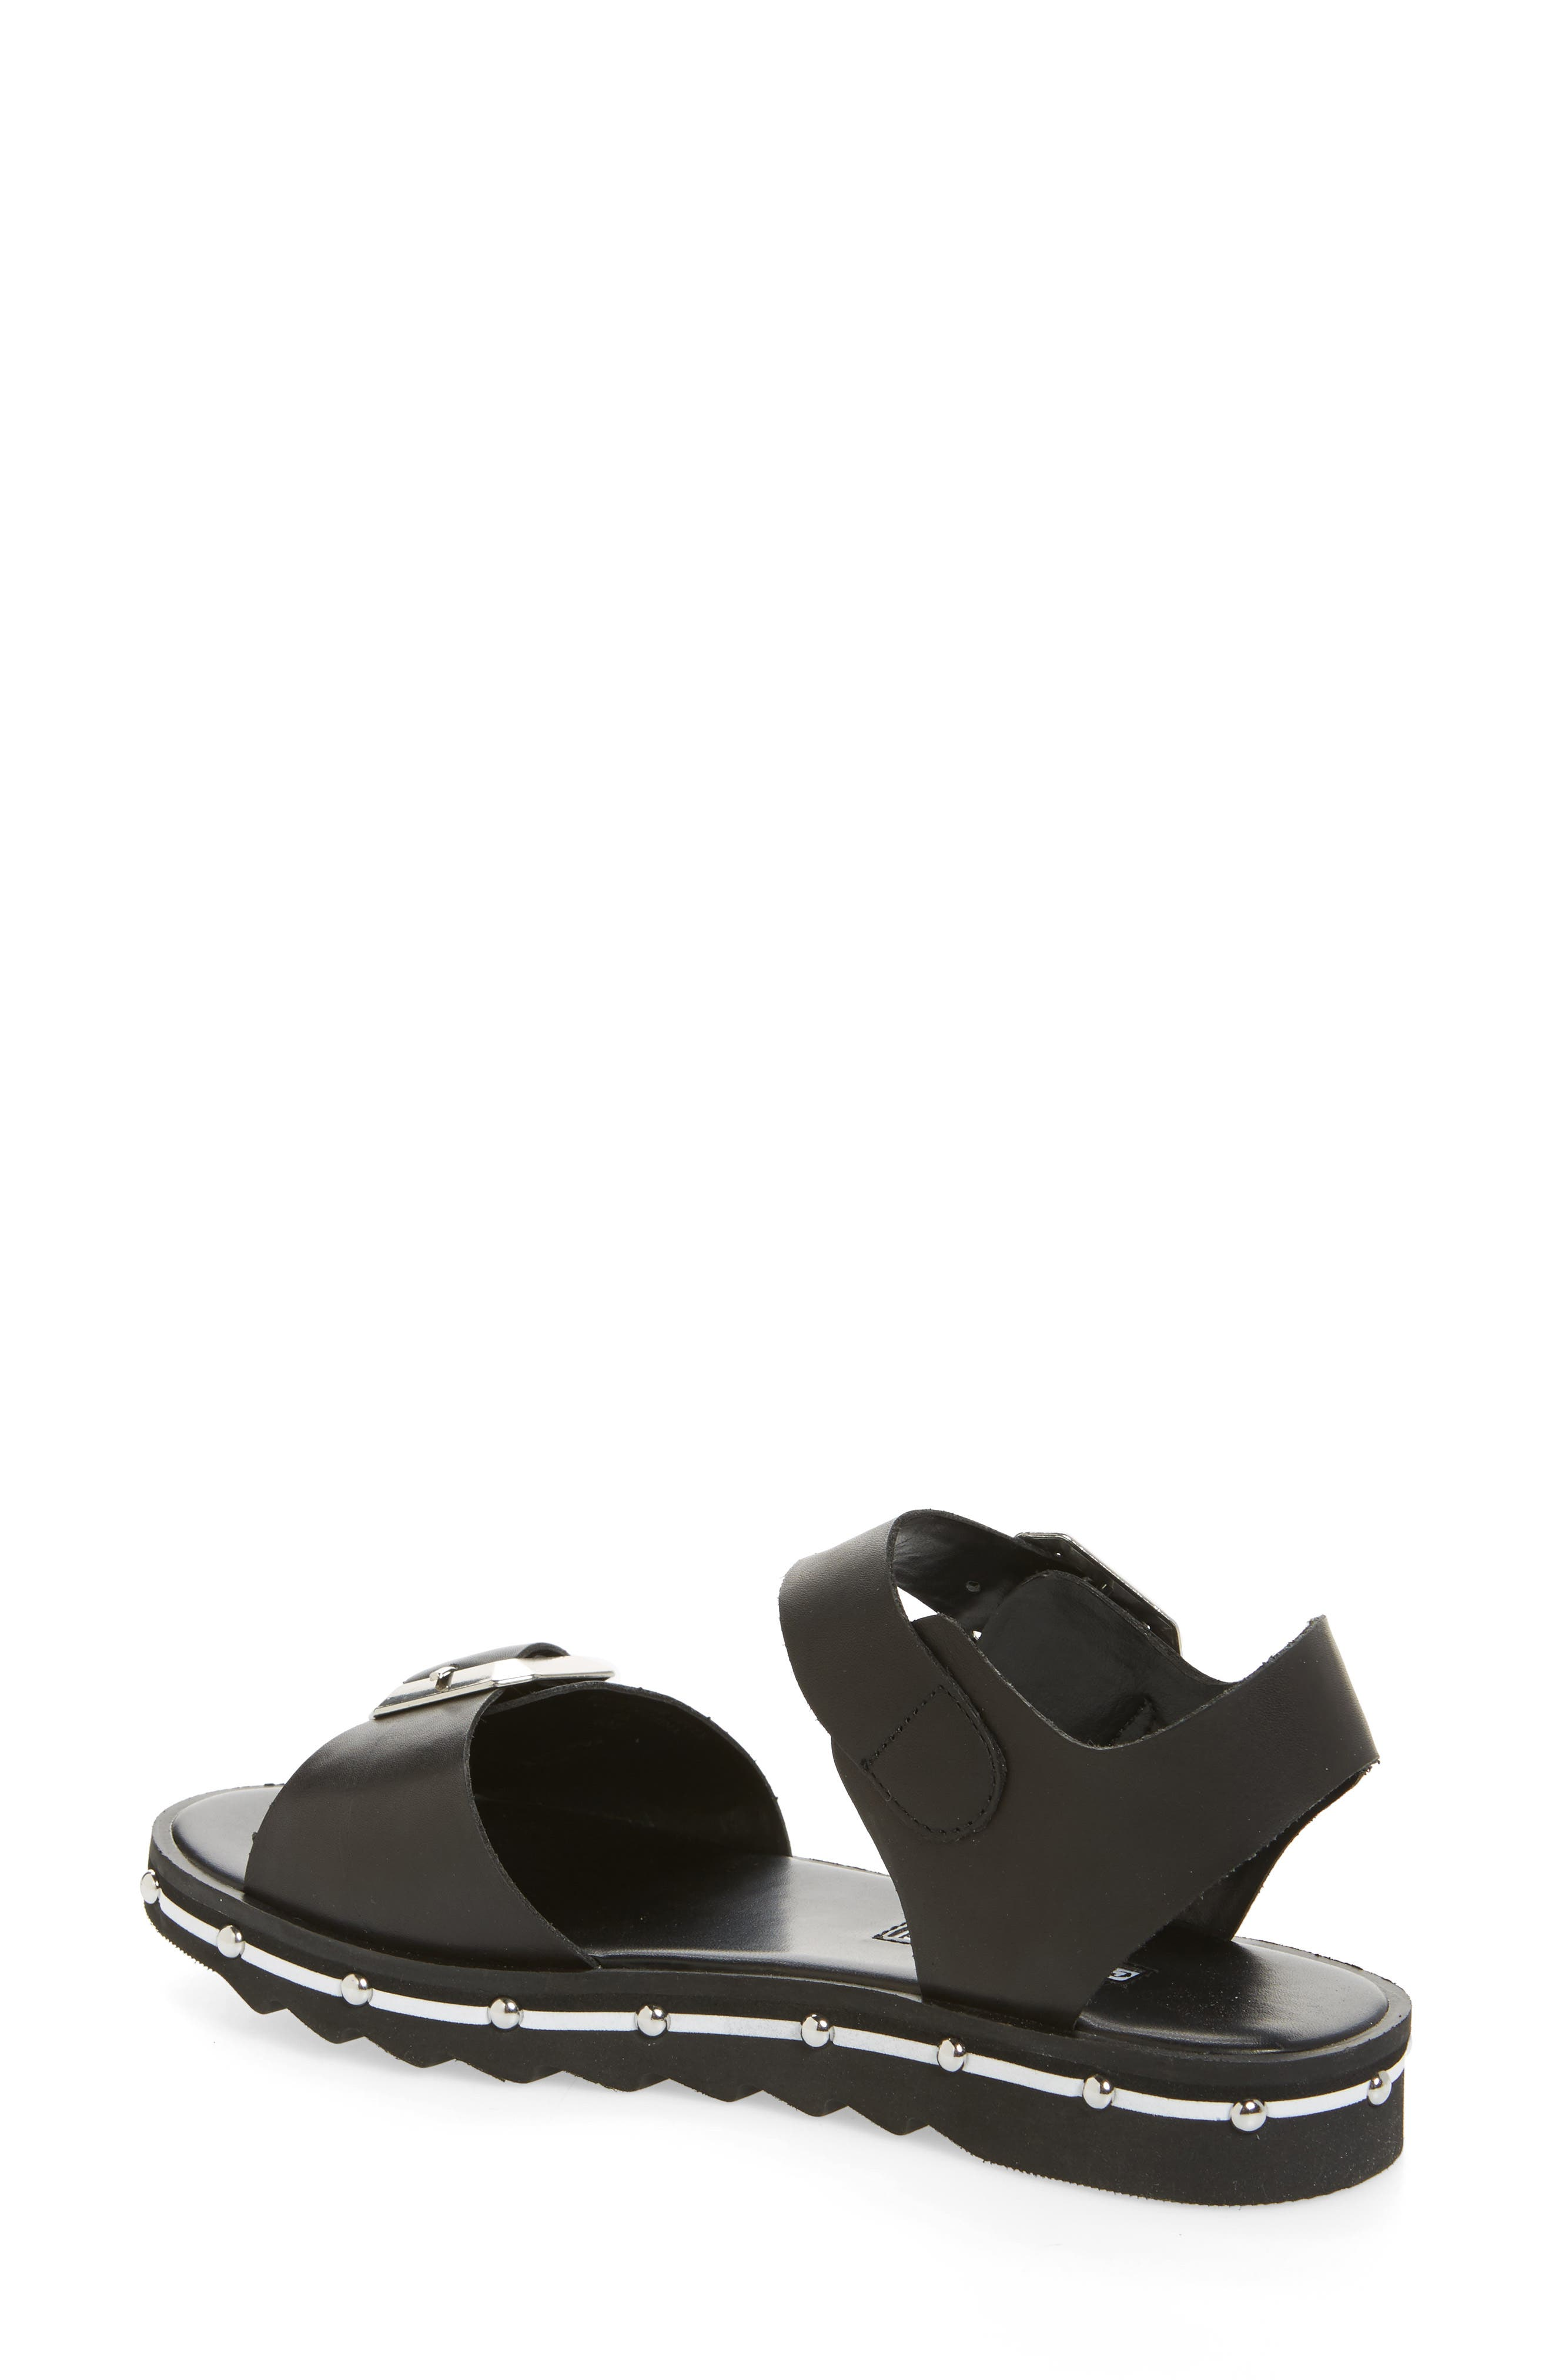 Spy Sandal,                             Alternate thumbnail 2, color,                             Black Leather